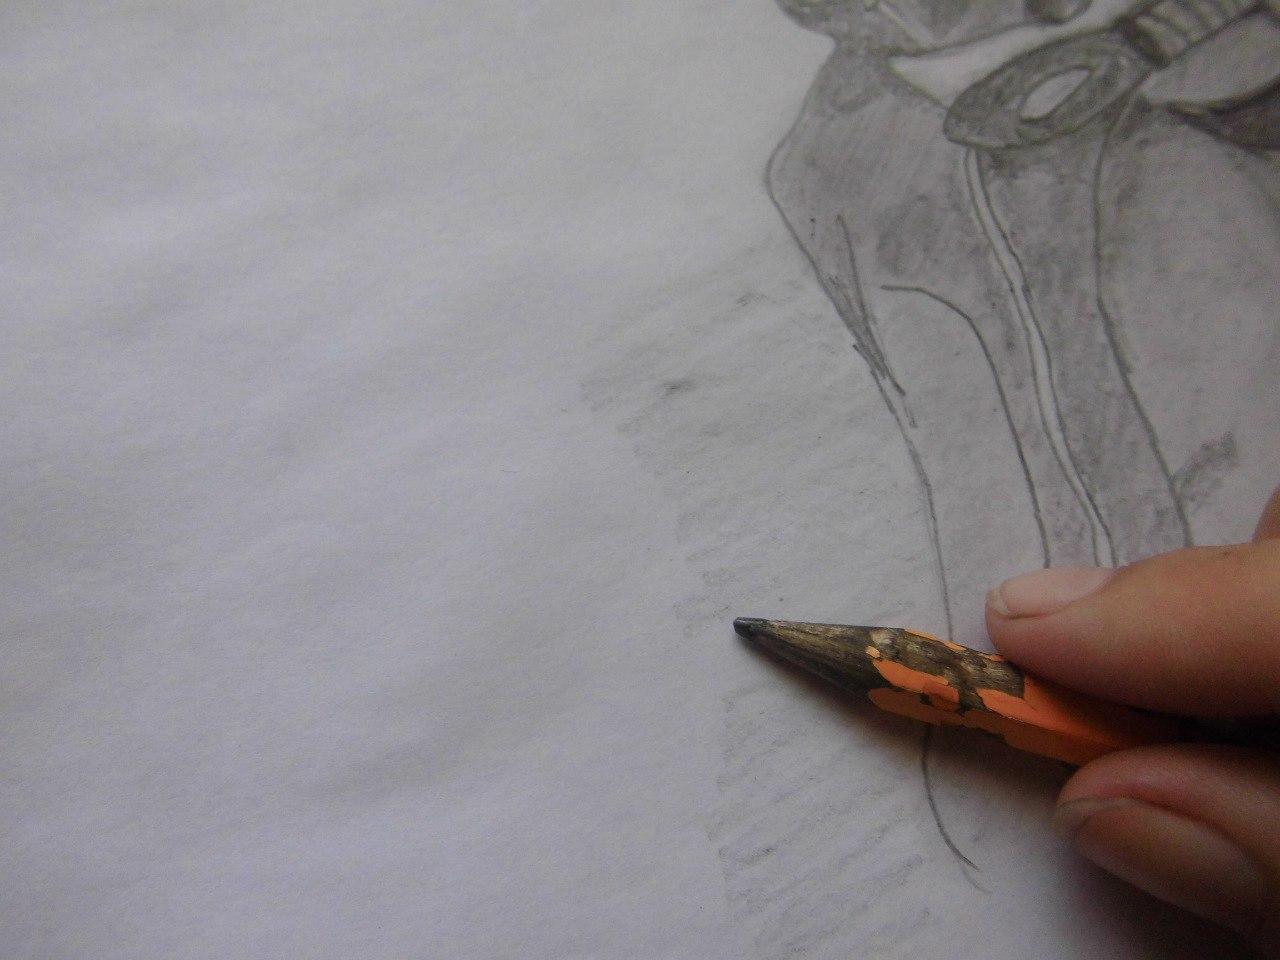 Рисуем Наруто с ножом - шаг 15